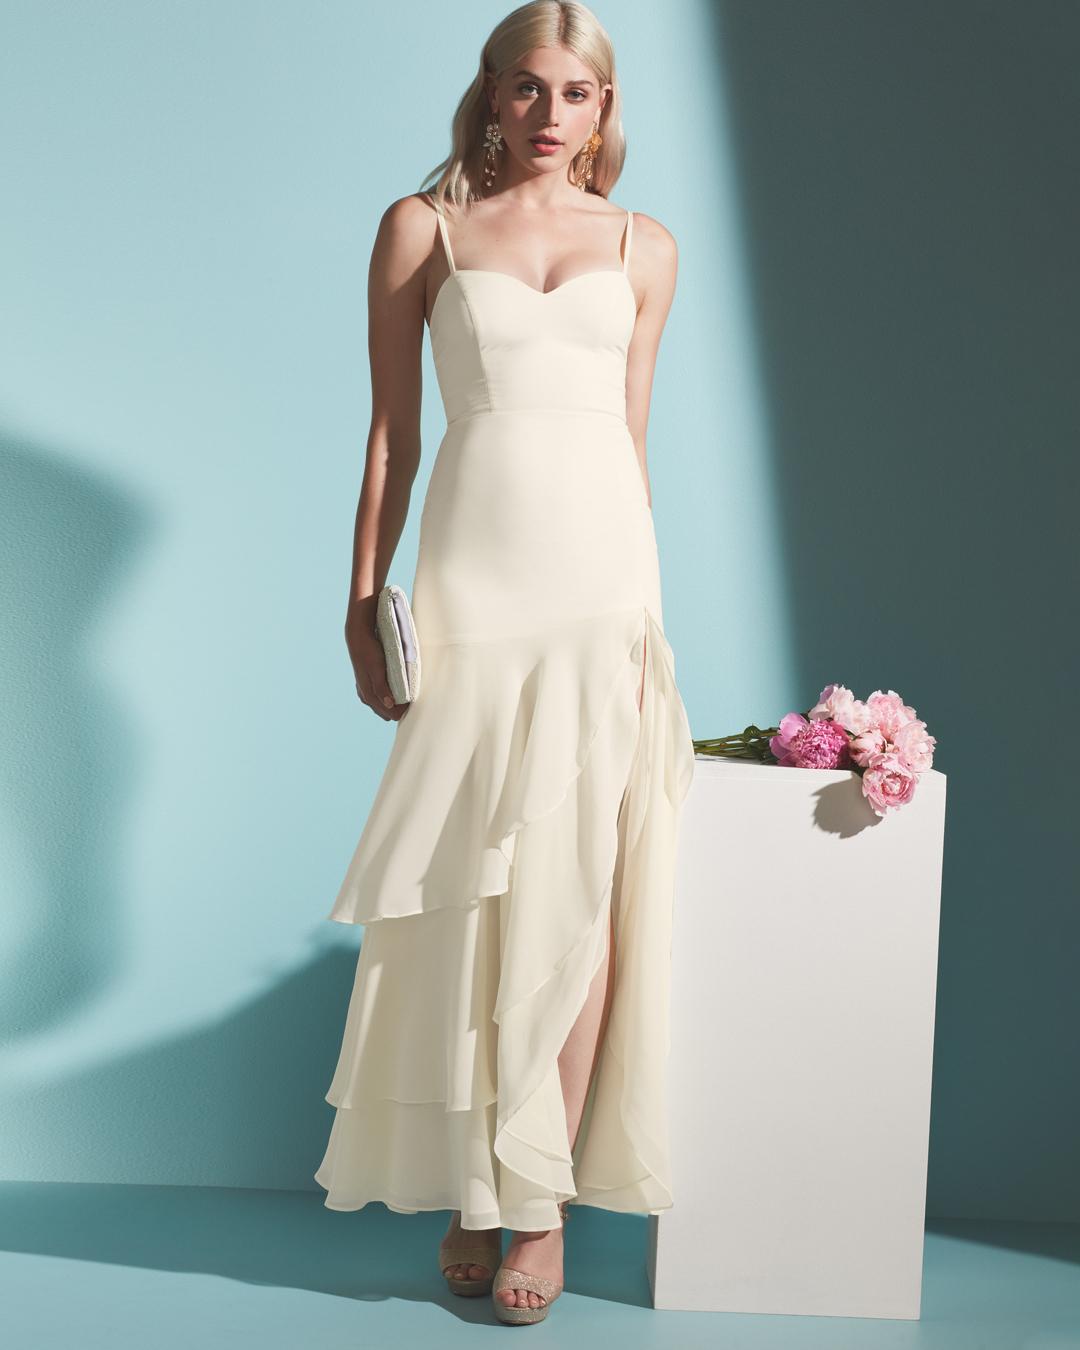 Bride in long ruffled wedding dress by Fame & Partners x David's Bridal